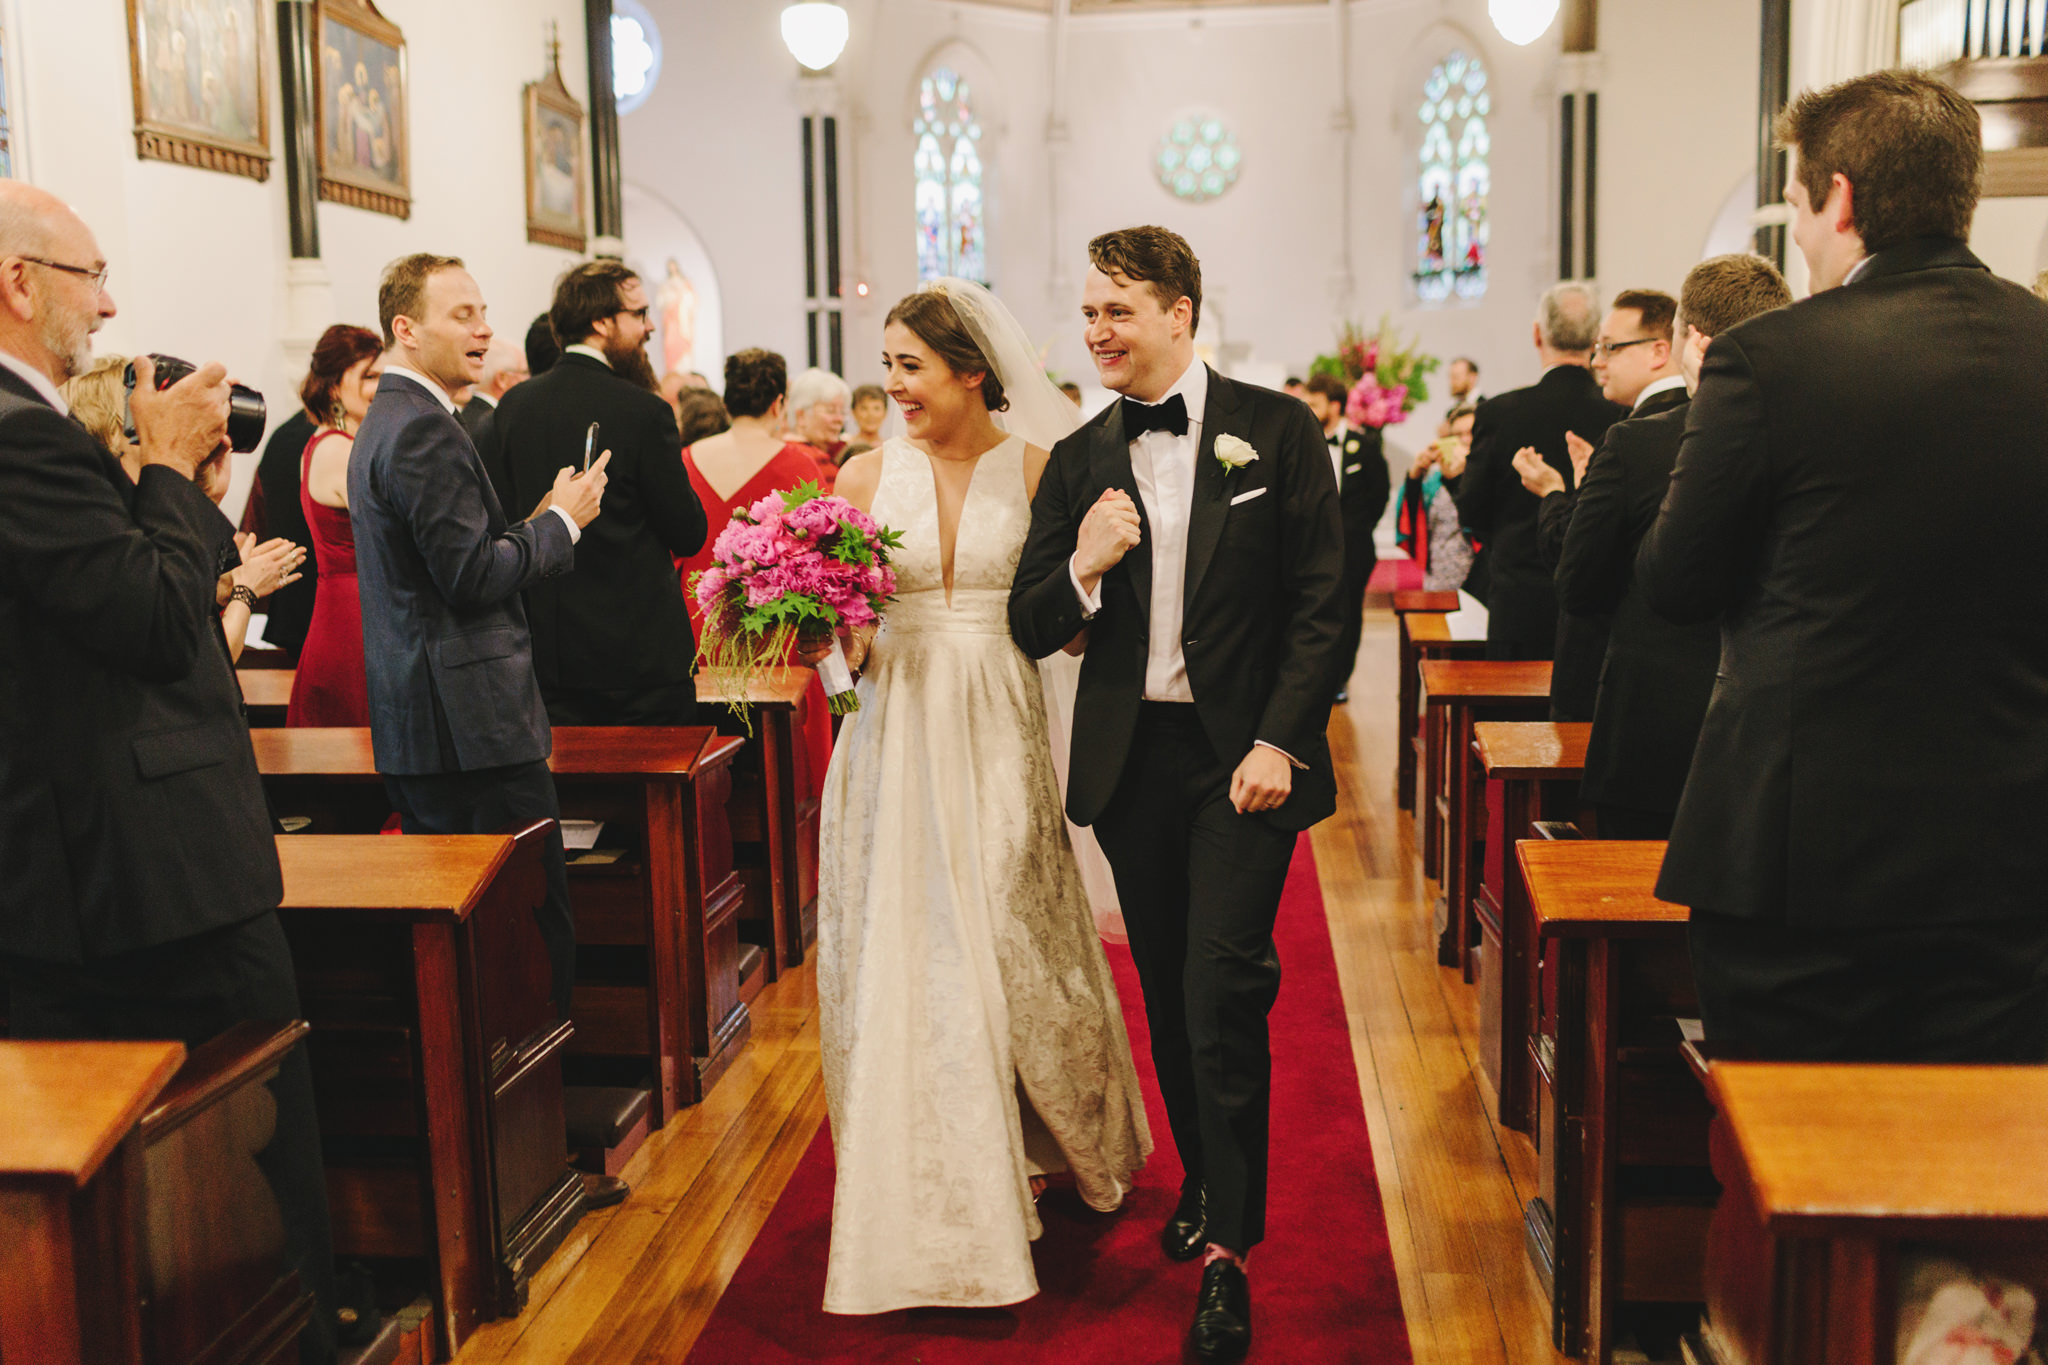 Abbotsford_Convent_Wedding_Peter_Anna070.JPG